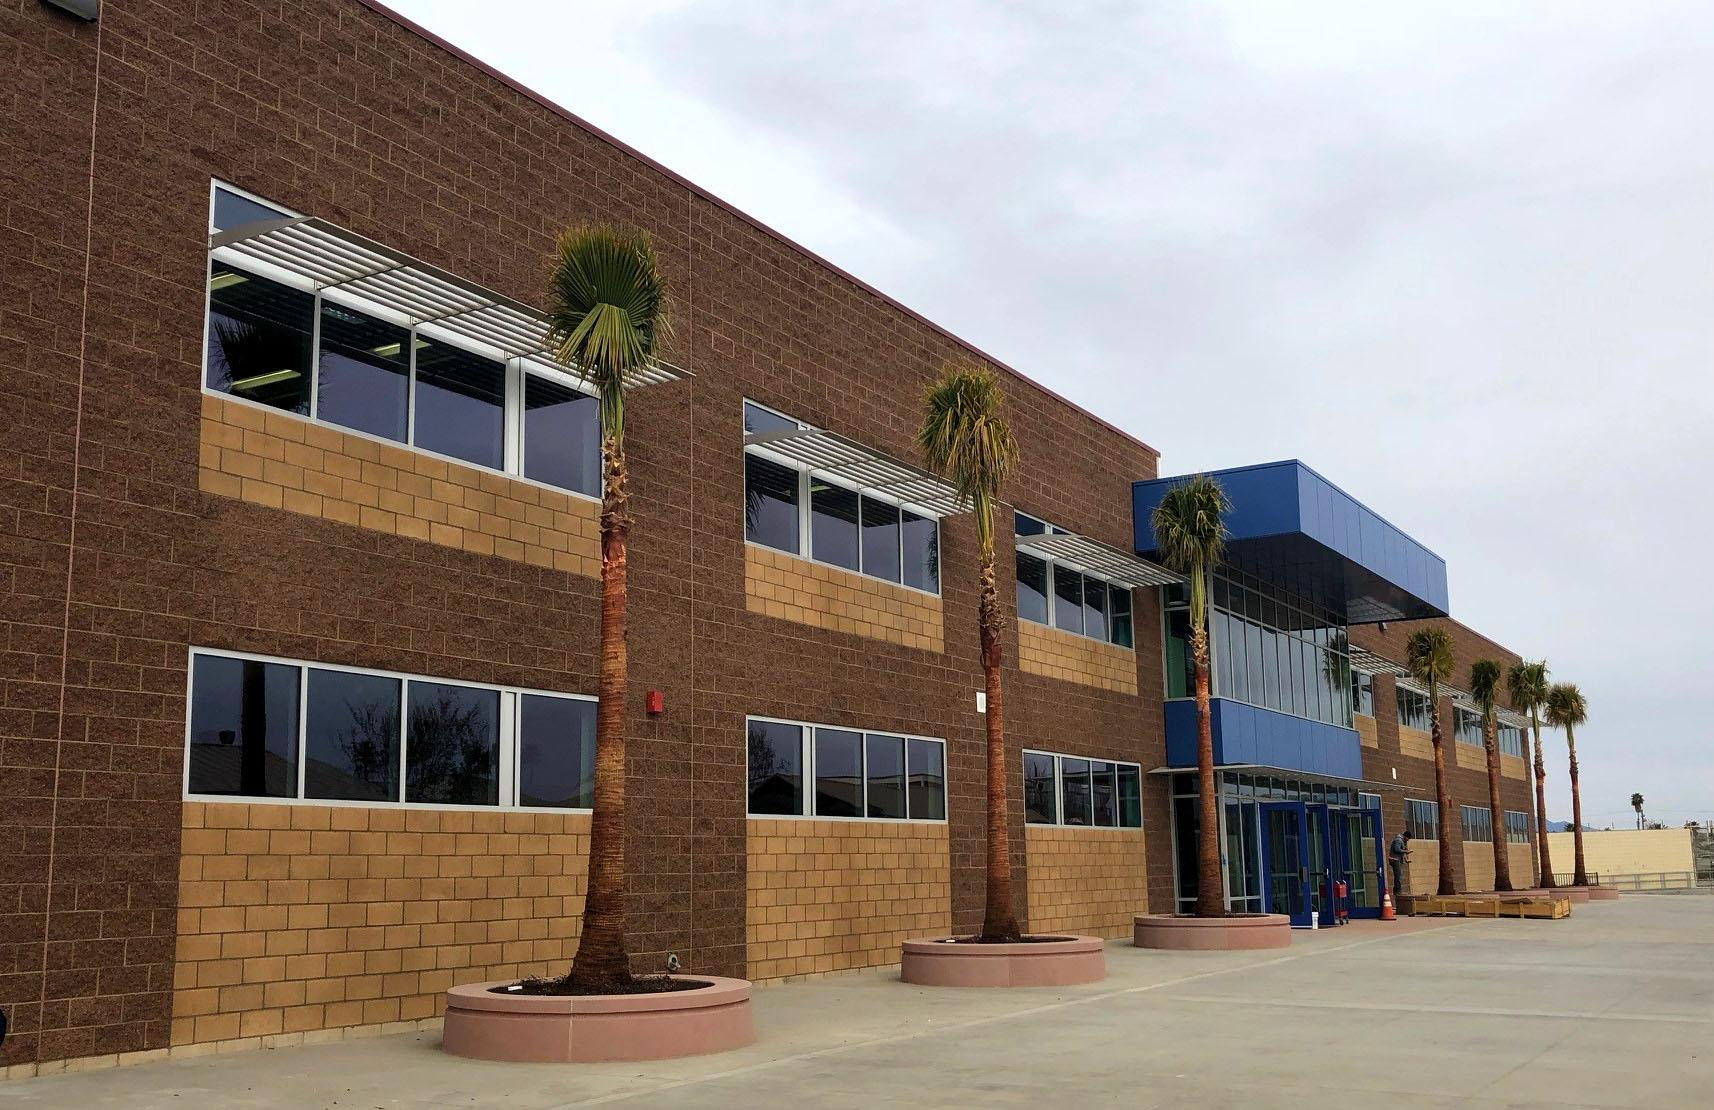 Moreno Valley HS